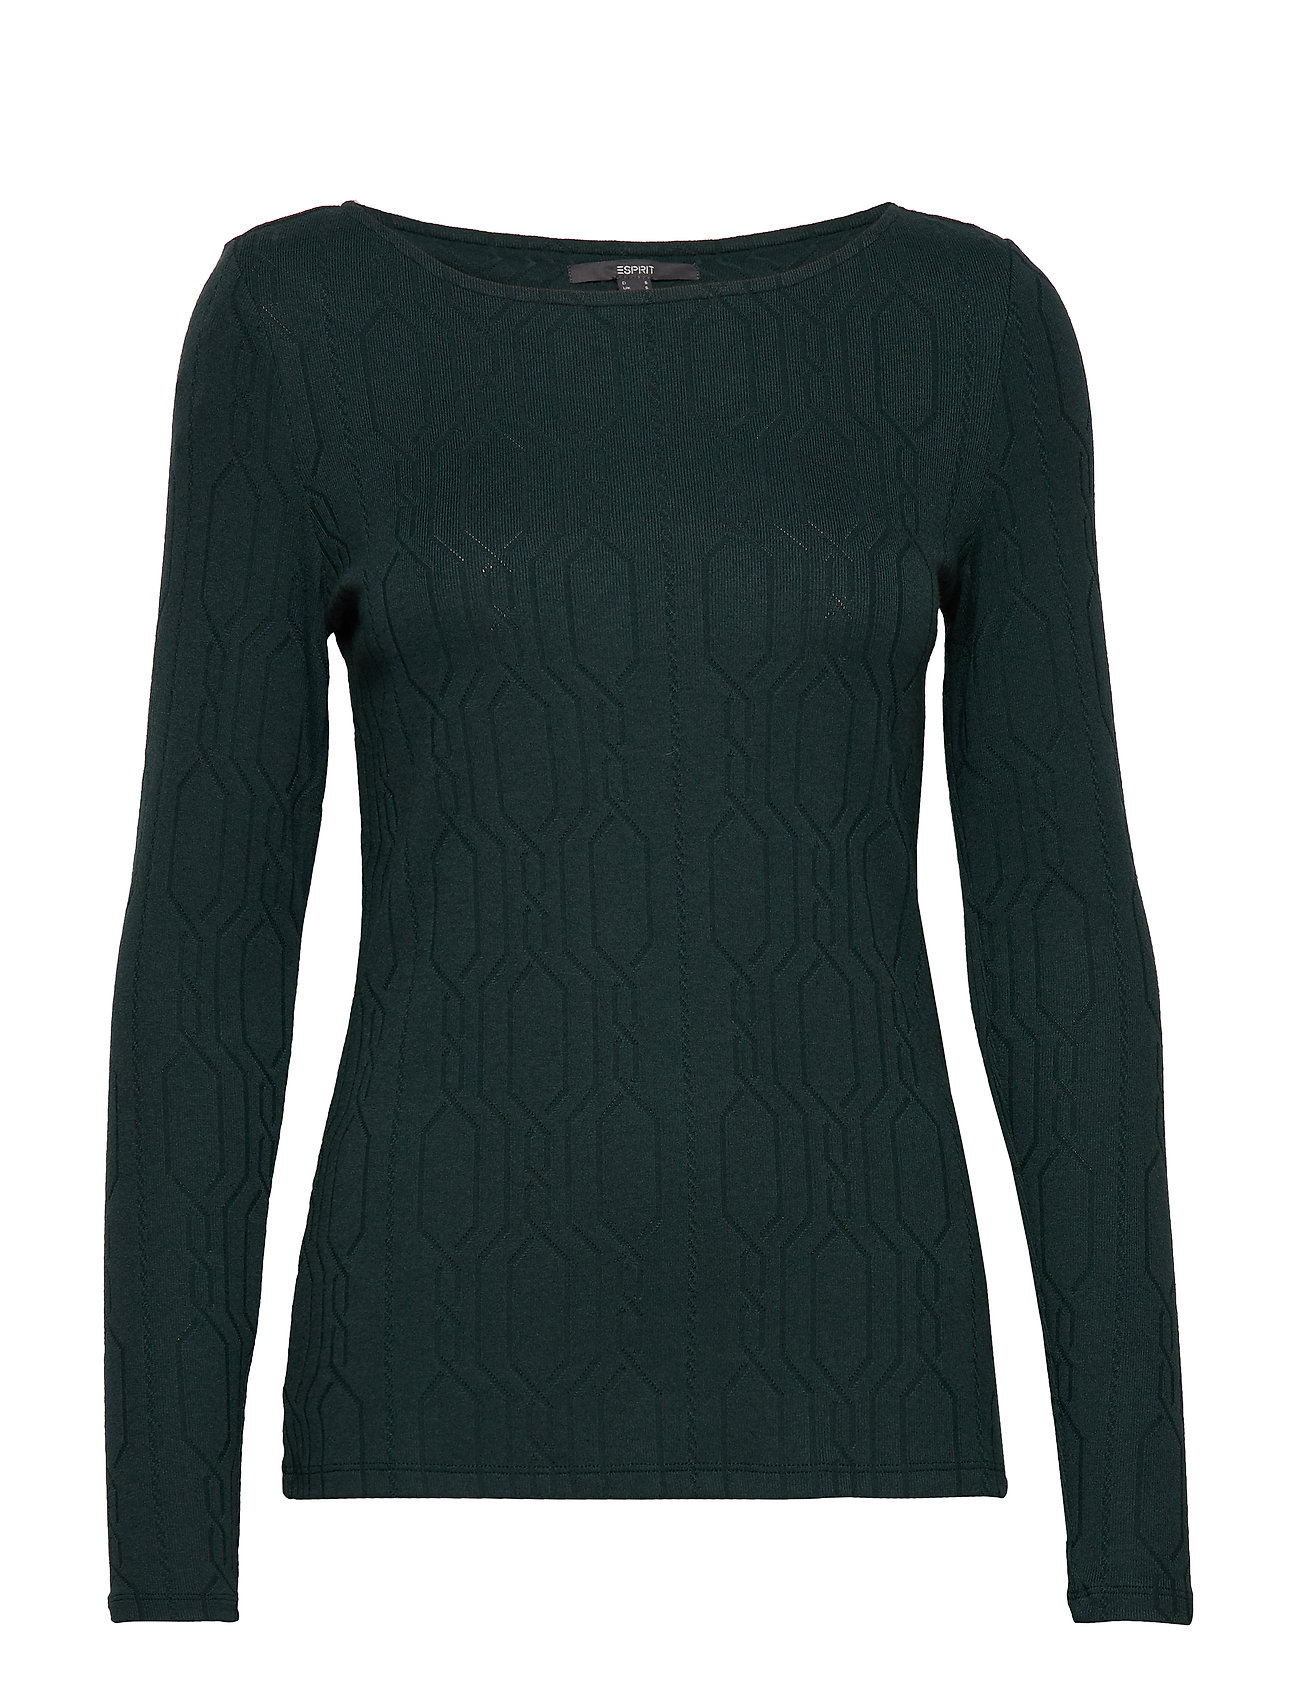 Esprit Collection T-Shirts - DARK TEAL GREEN